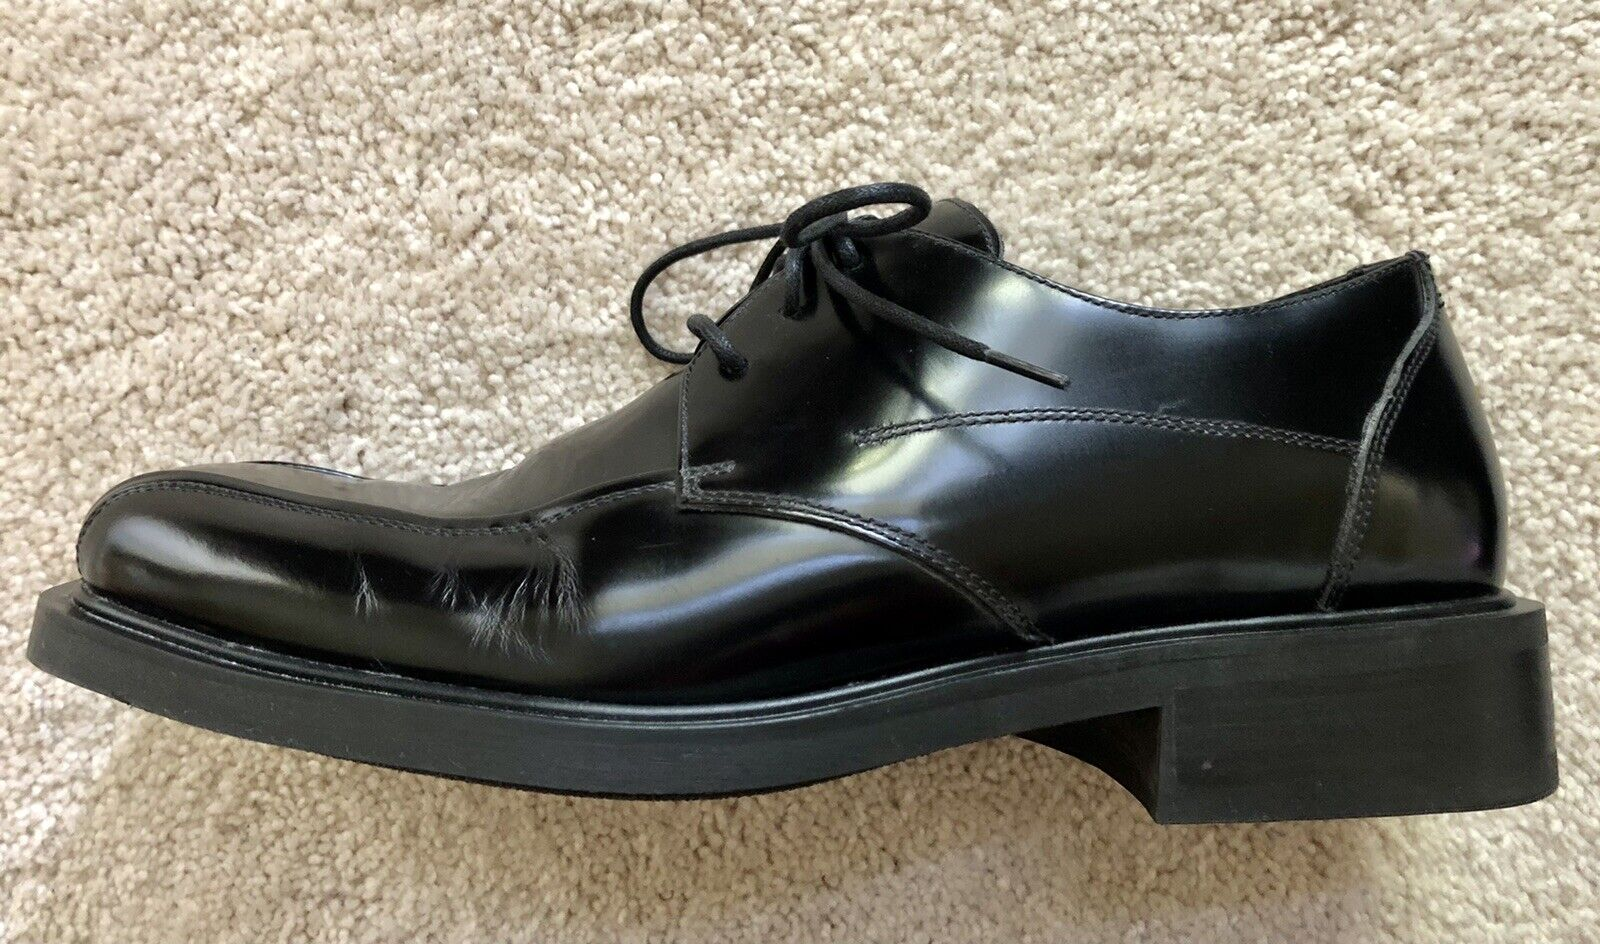 Kenneth Cole Reaction Men's Black Leather lace-up shoes Size 11.5 Rubber Soles